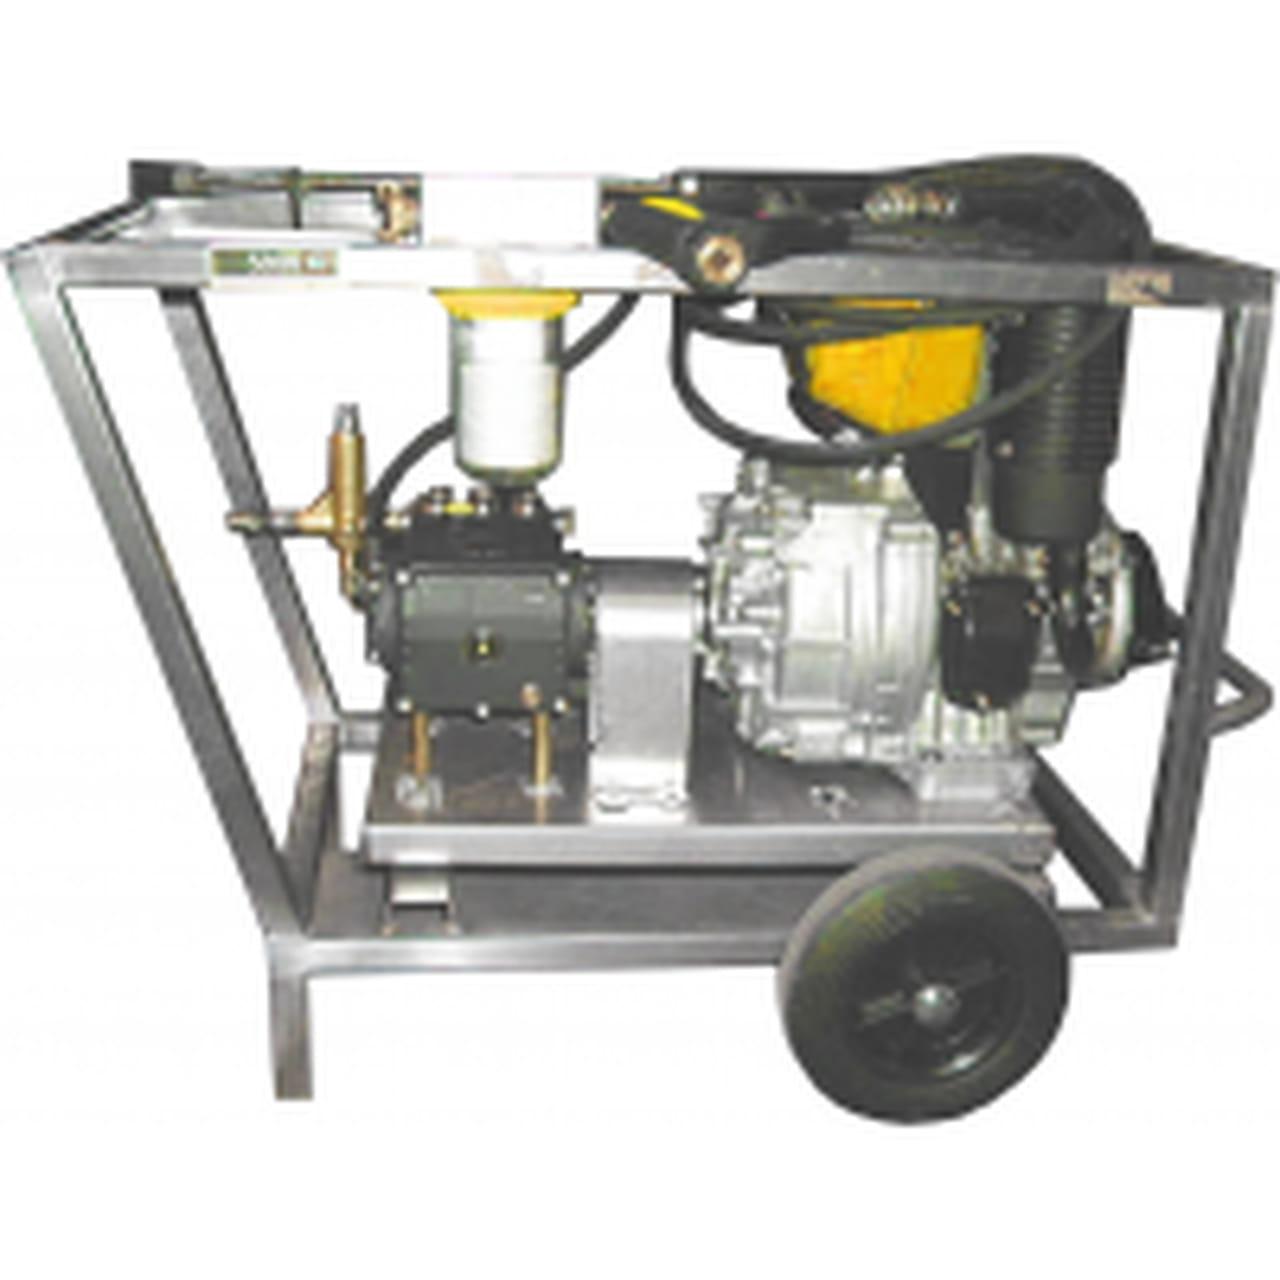 Nettoyeur haute pression diesel 200 bar 15 l mn - Nettoyeur haute pression 200 bars ...